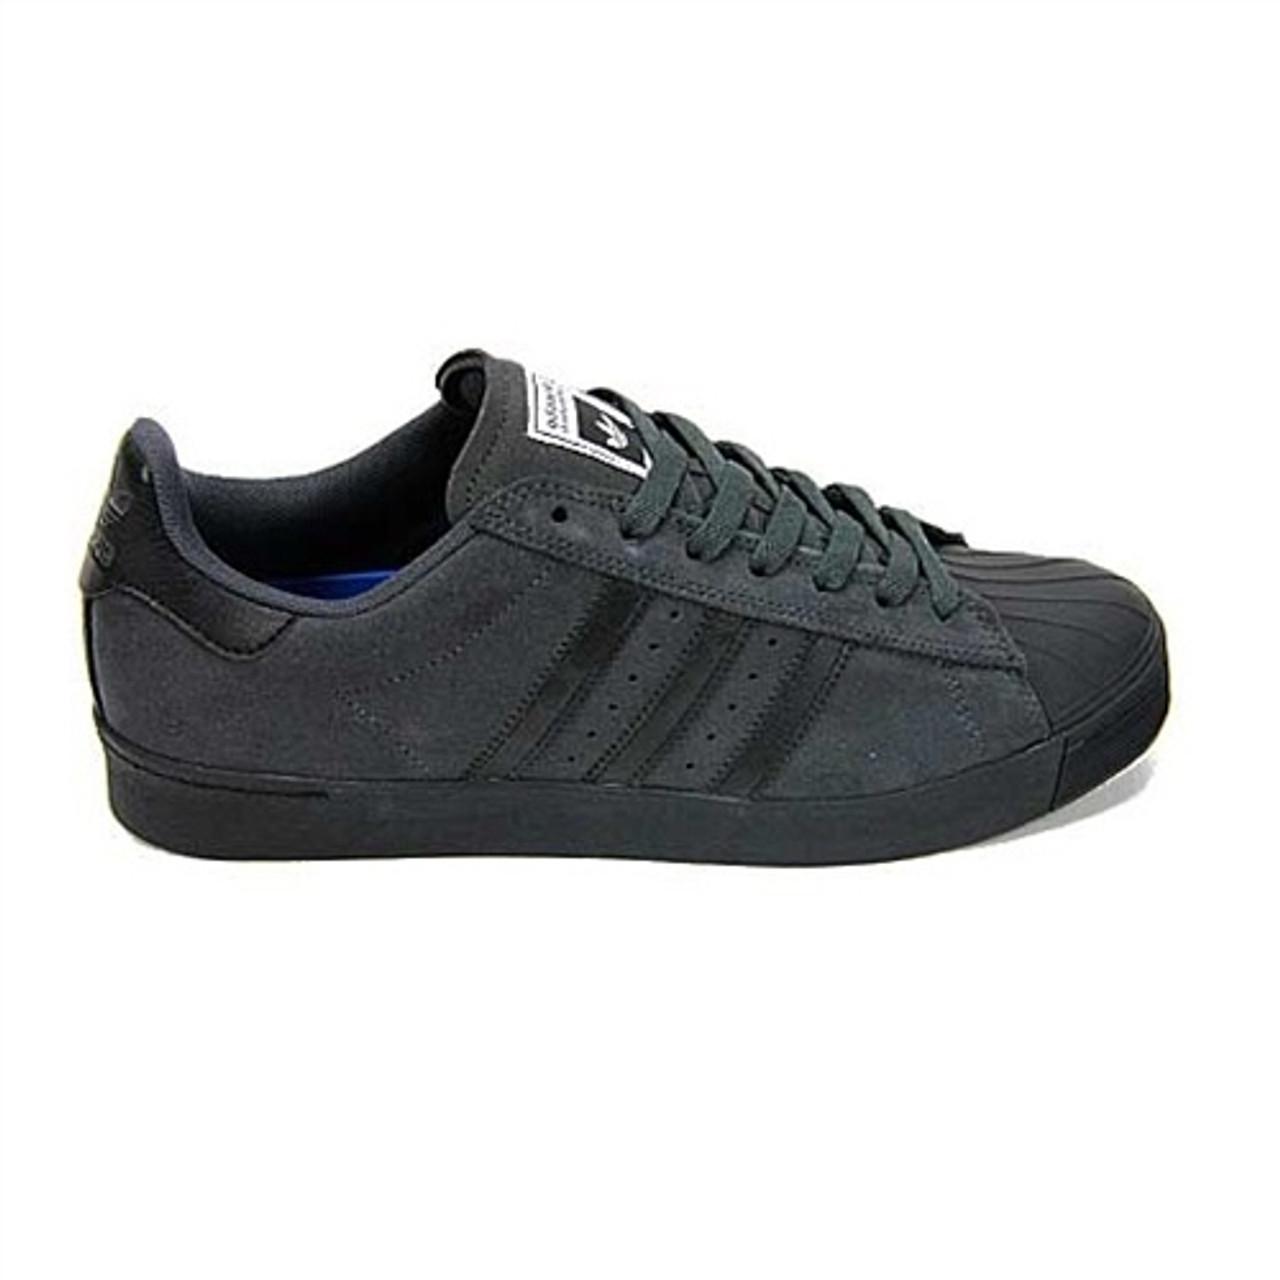 separation shoes 63bb3 66bd7 Adidas Superstar Vulc ADV Shell Toe Shoes Dark Grey Black